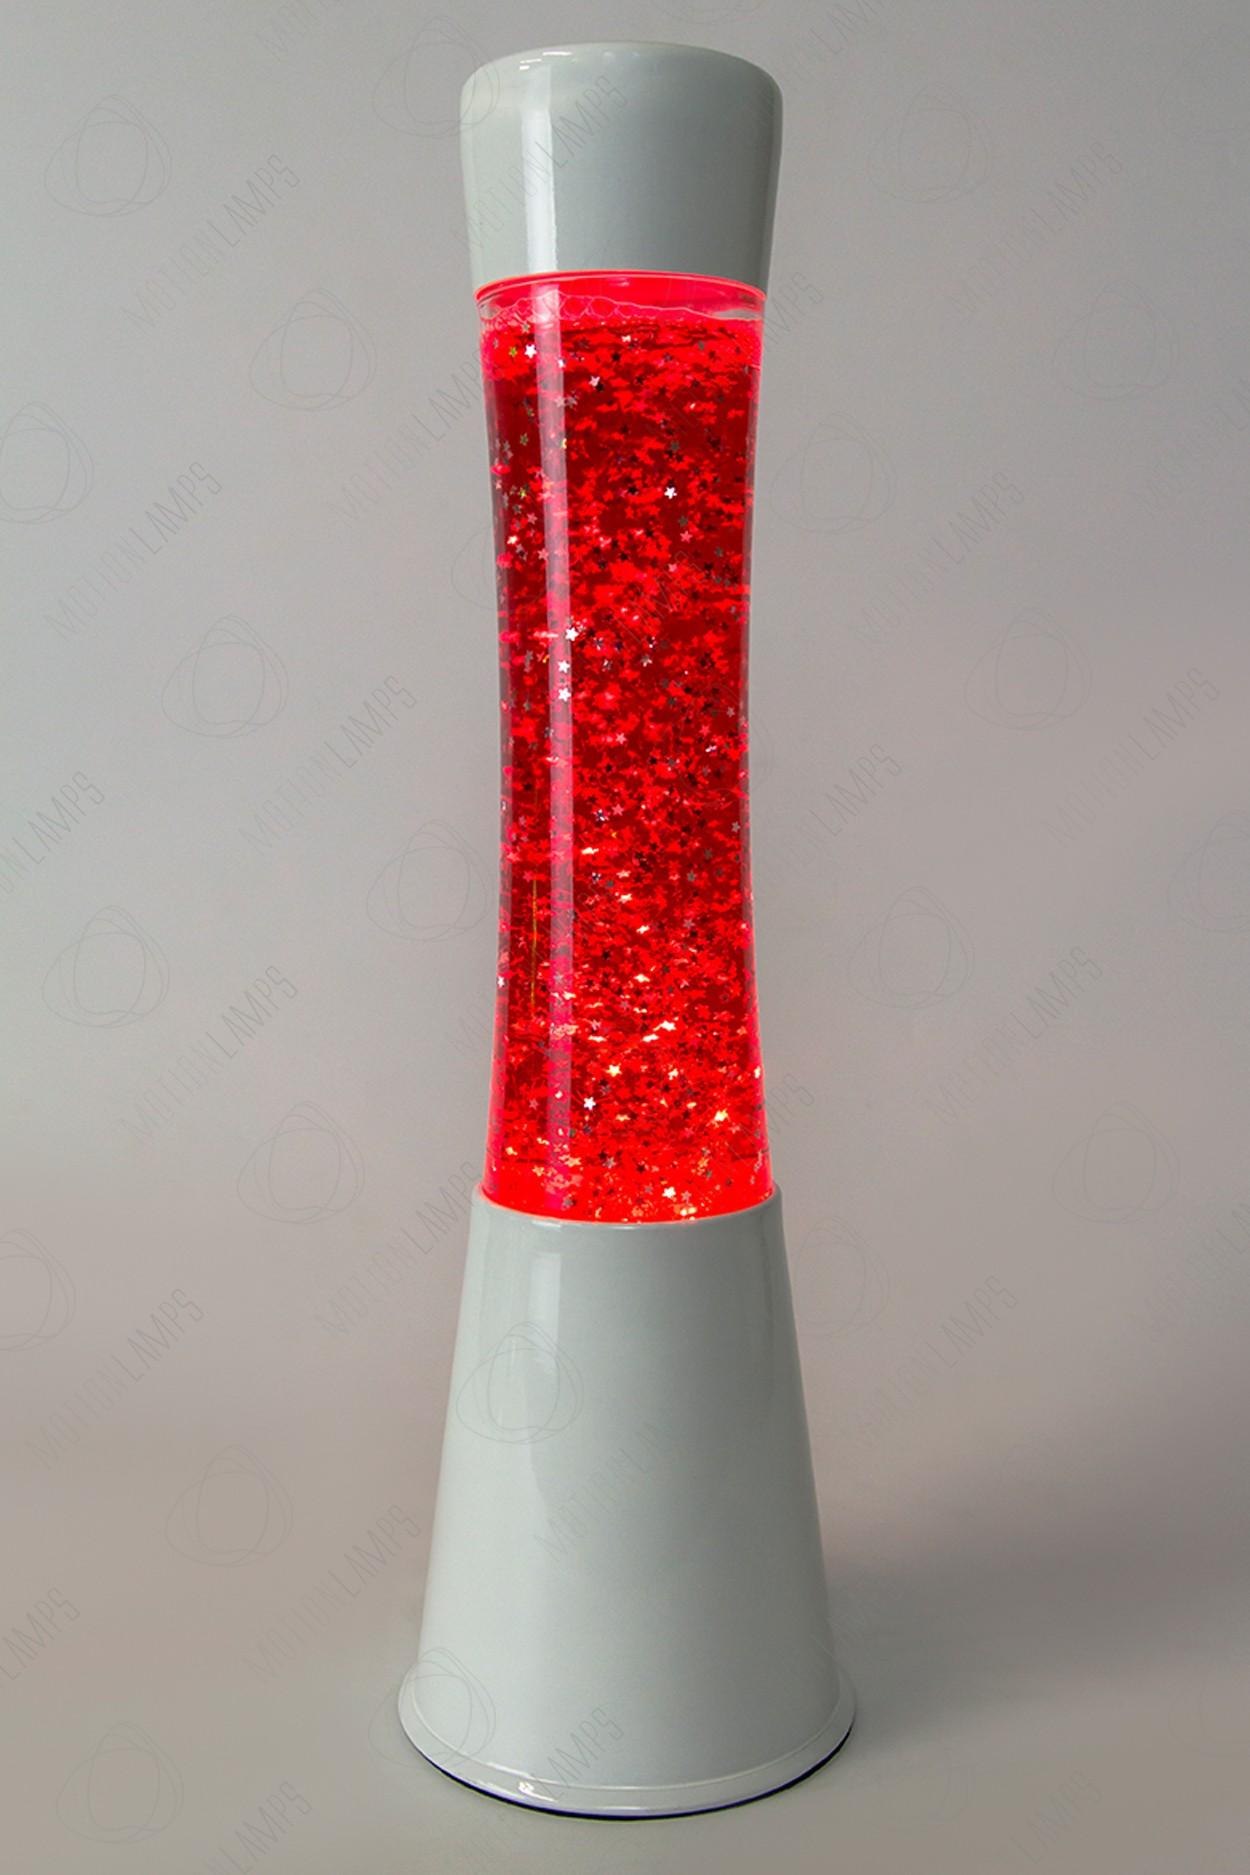 Лава-лампа 39см CG-W Красная/Блёстки (Глиттер)